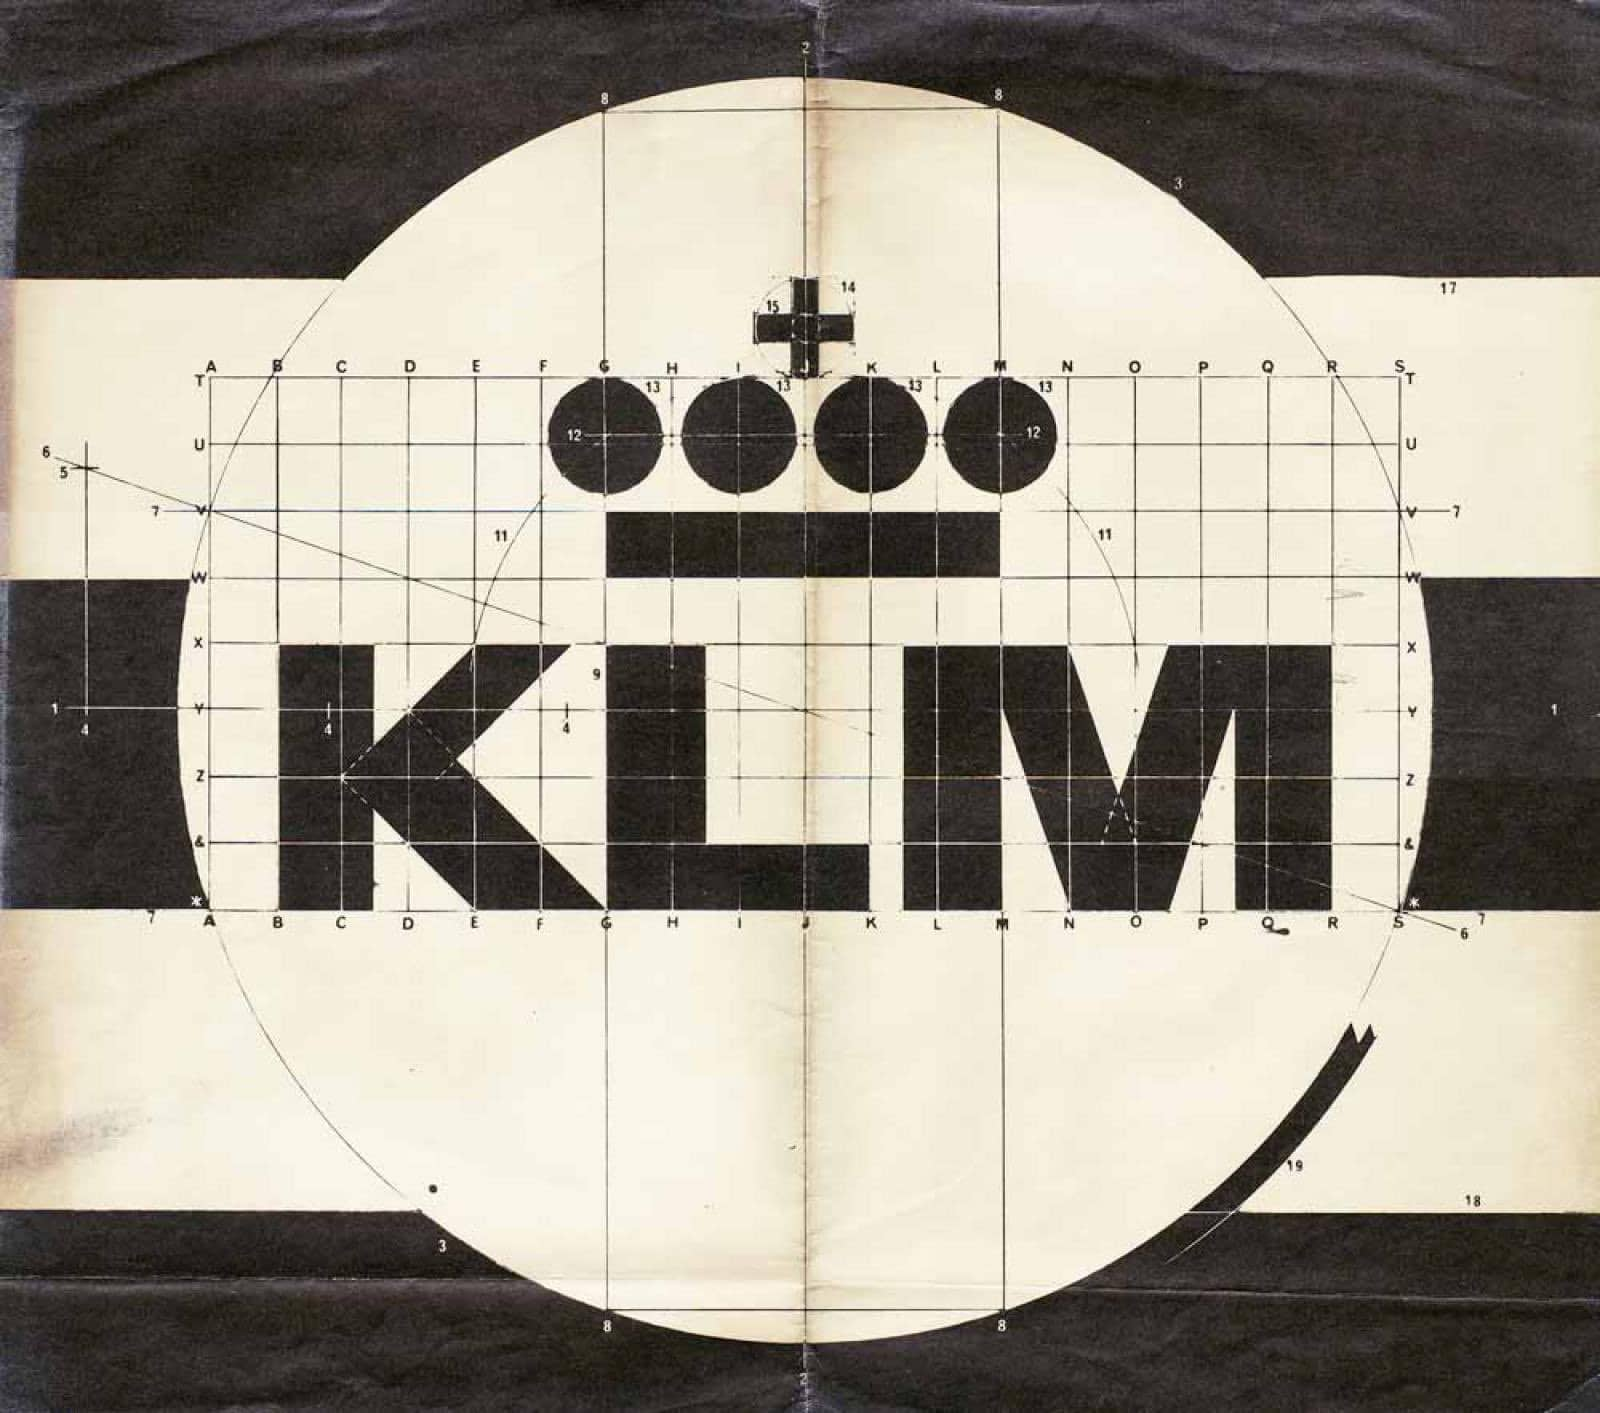 KLM Logo Construciton Grid by FHK Henrion 1961